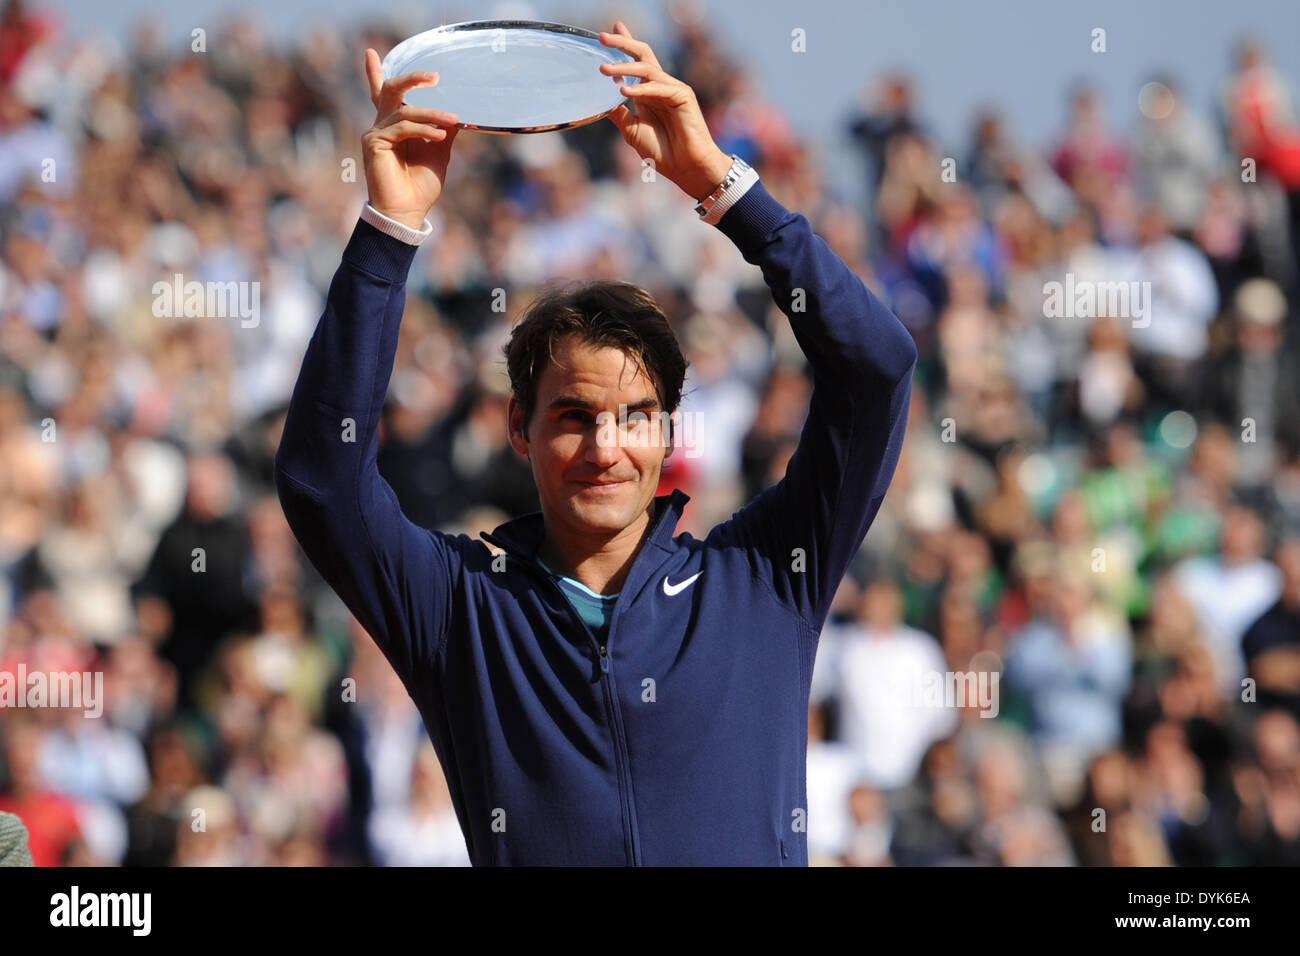 Atp Masters Tennis 2014 - image 10